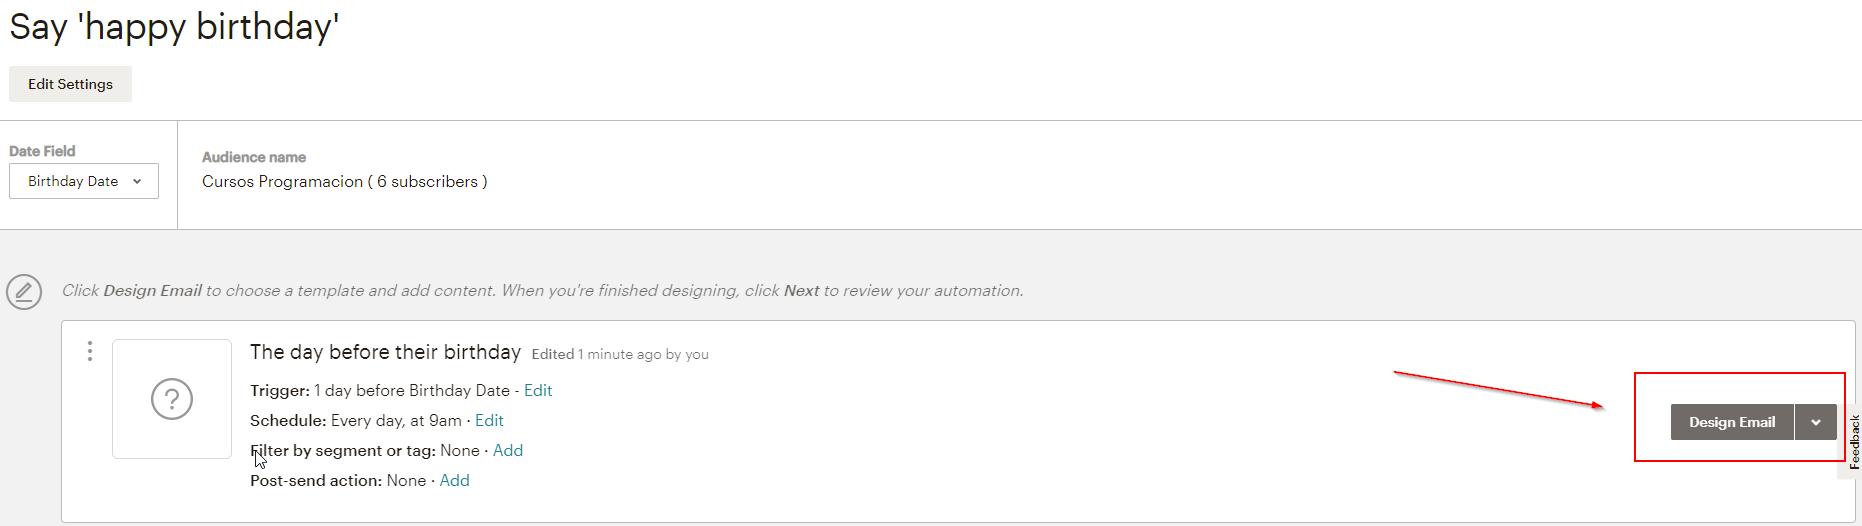 mailchimp design email